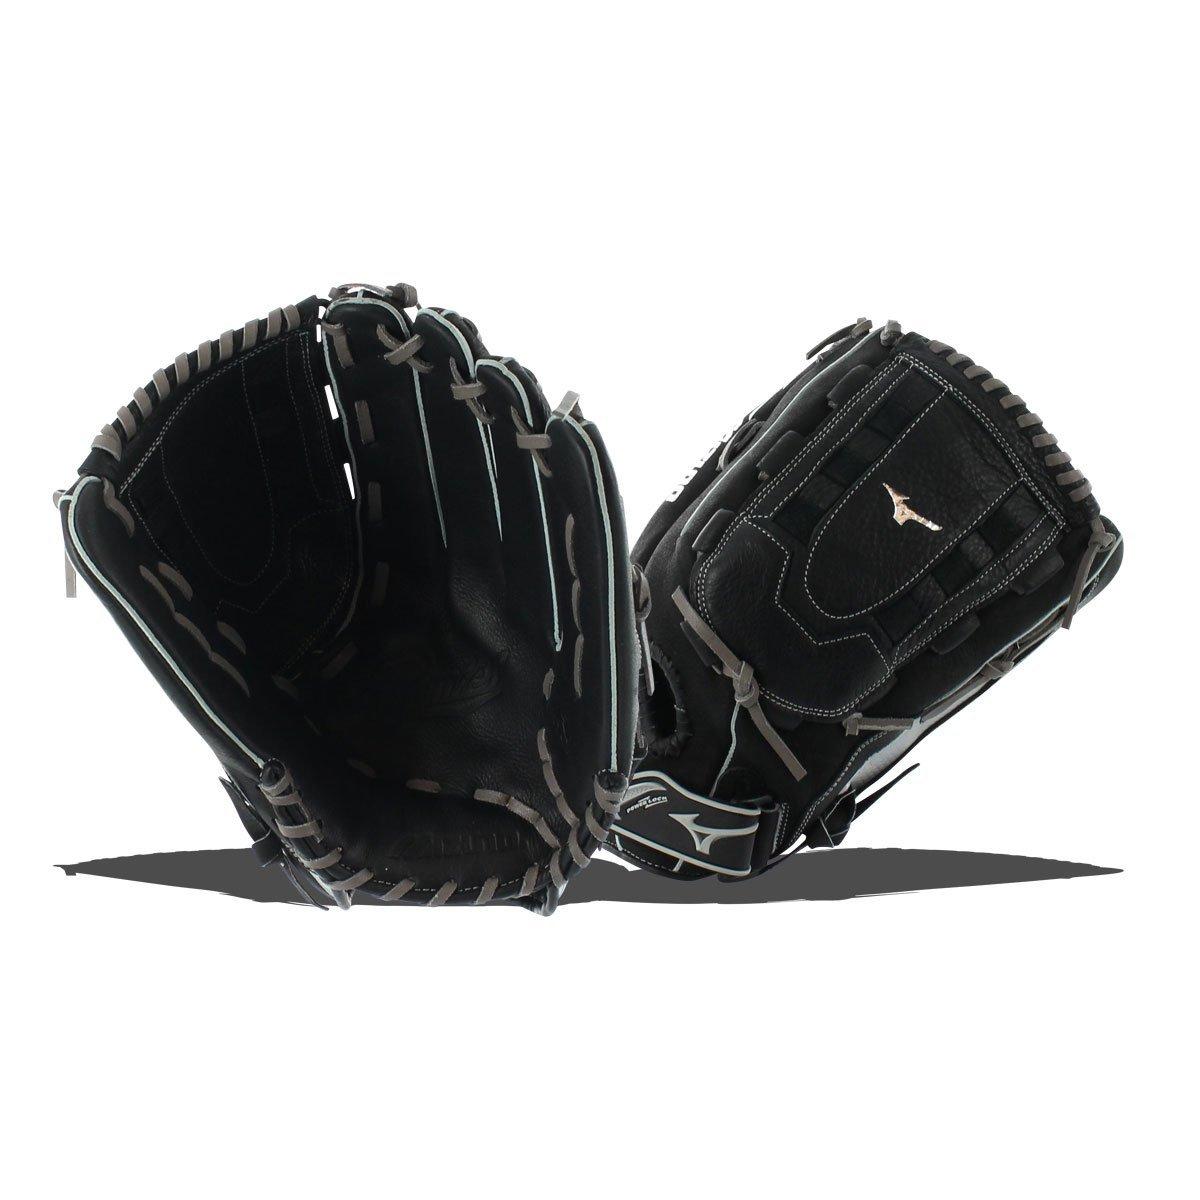 Cheap Mizuno Softball Glove Find Mizuno Softball Glove Deals On